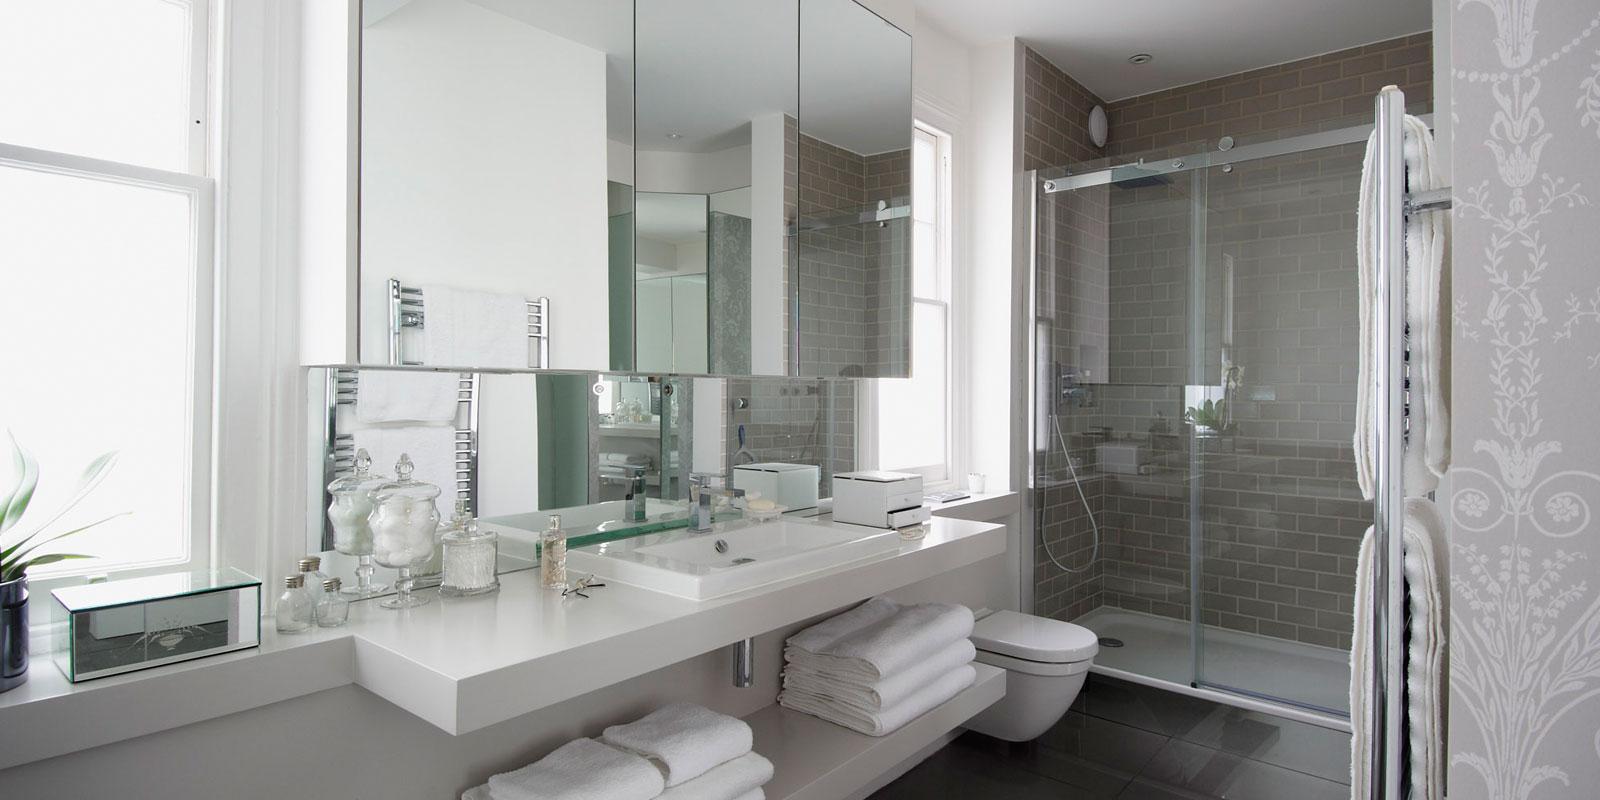 Best Kitchen Gallery: Handmade Bathroom Designers L Duncan Bruce L Made In England of Bathroom Designers  on rachelxblog.com